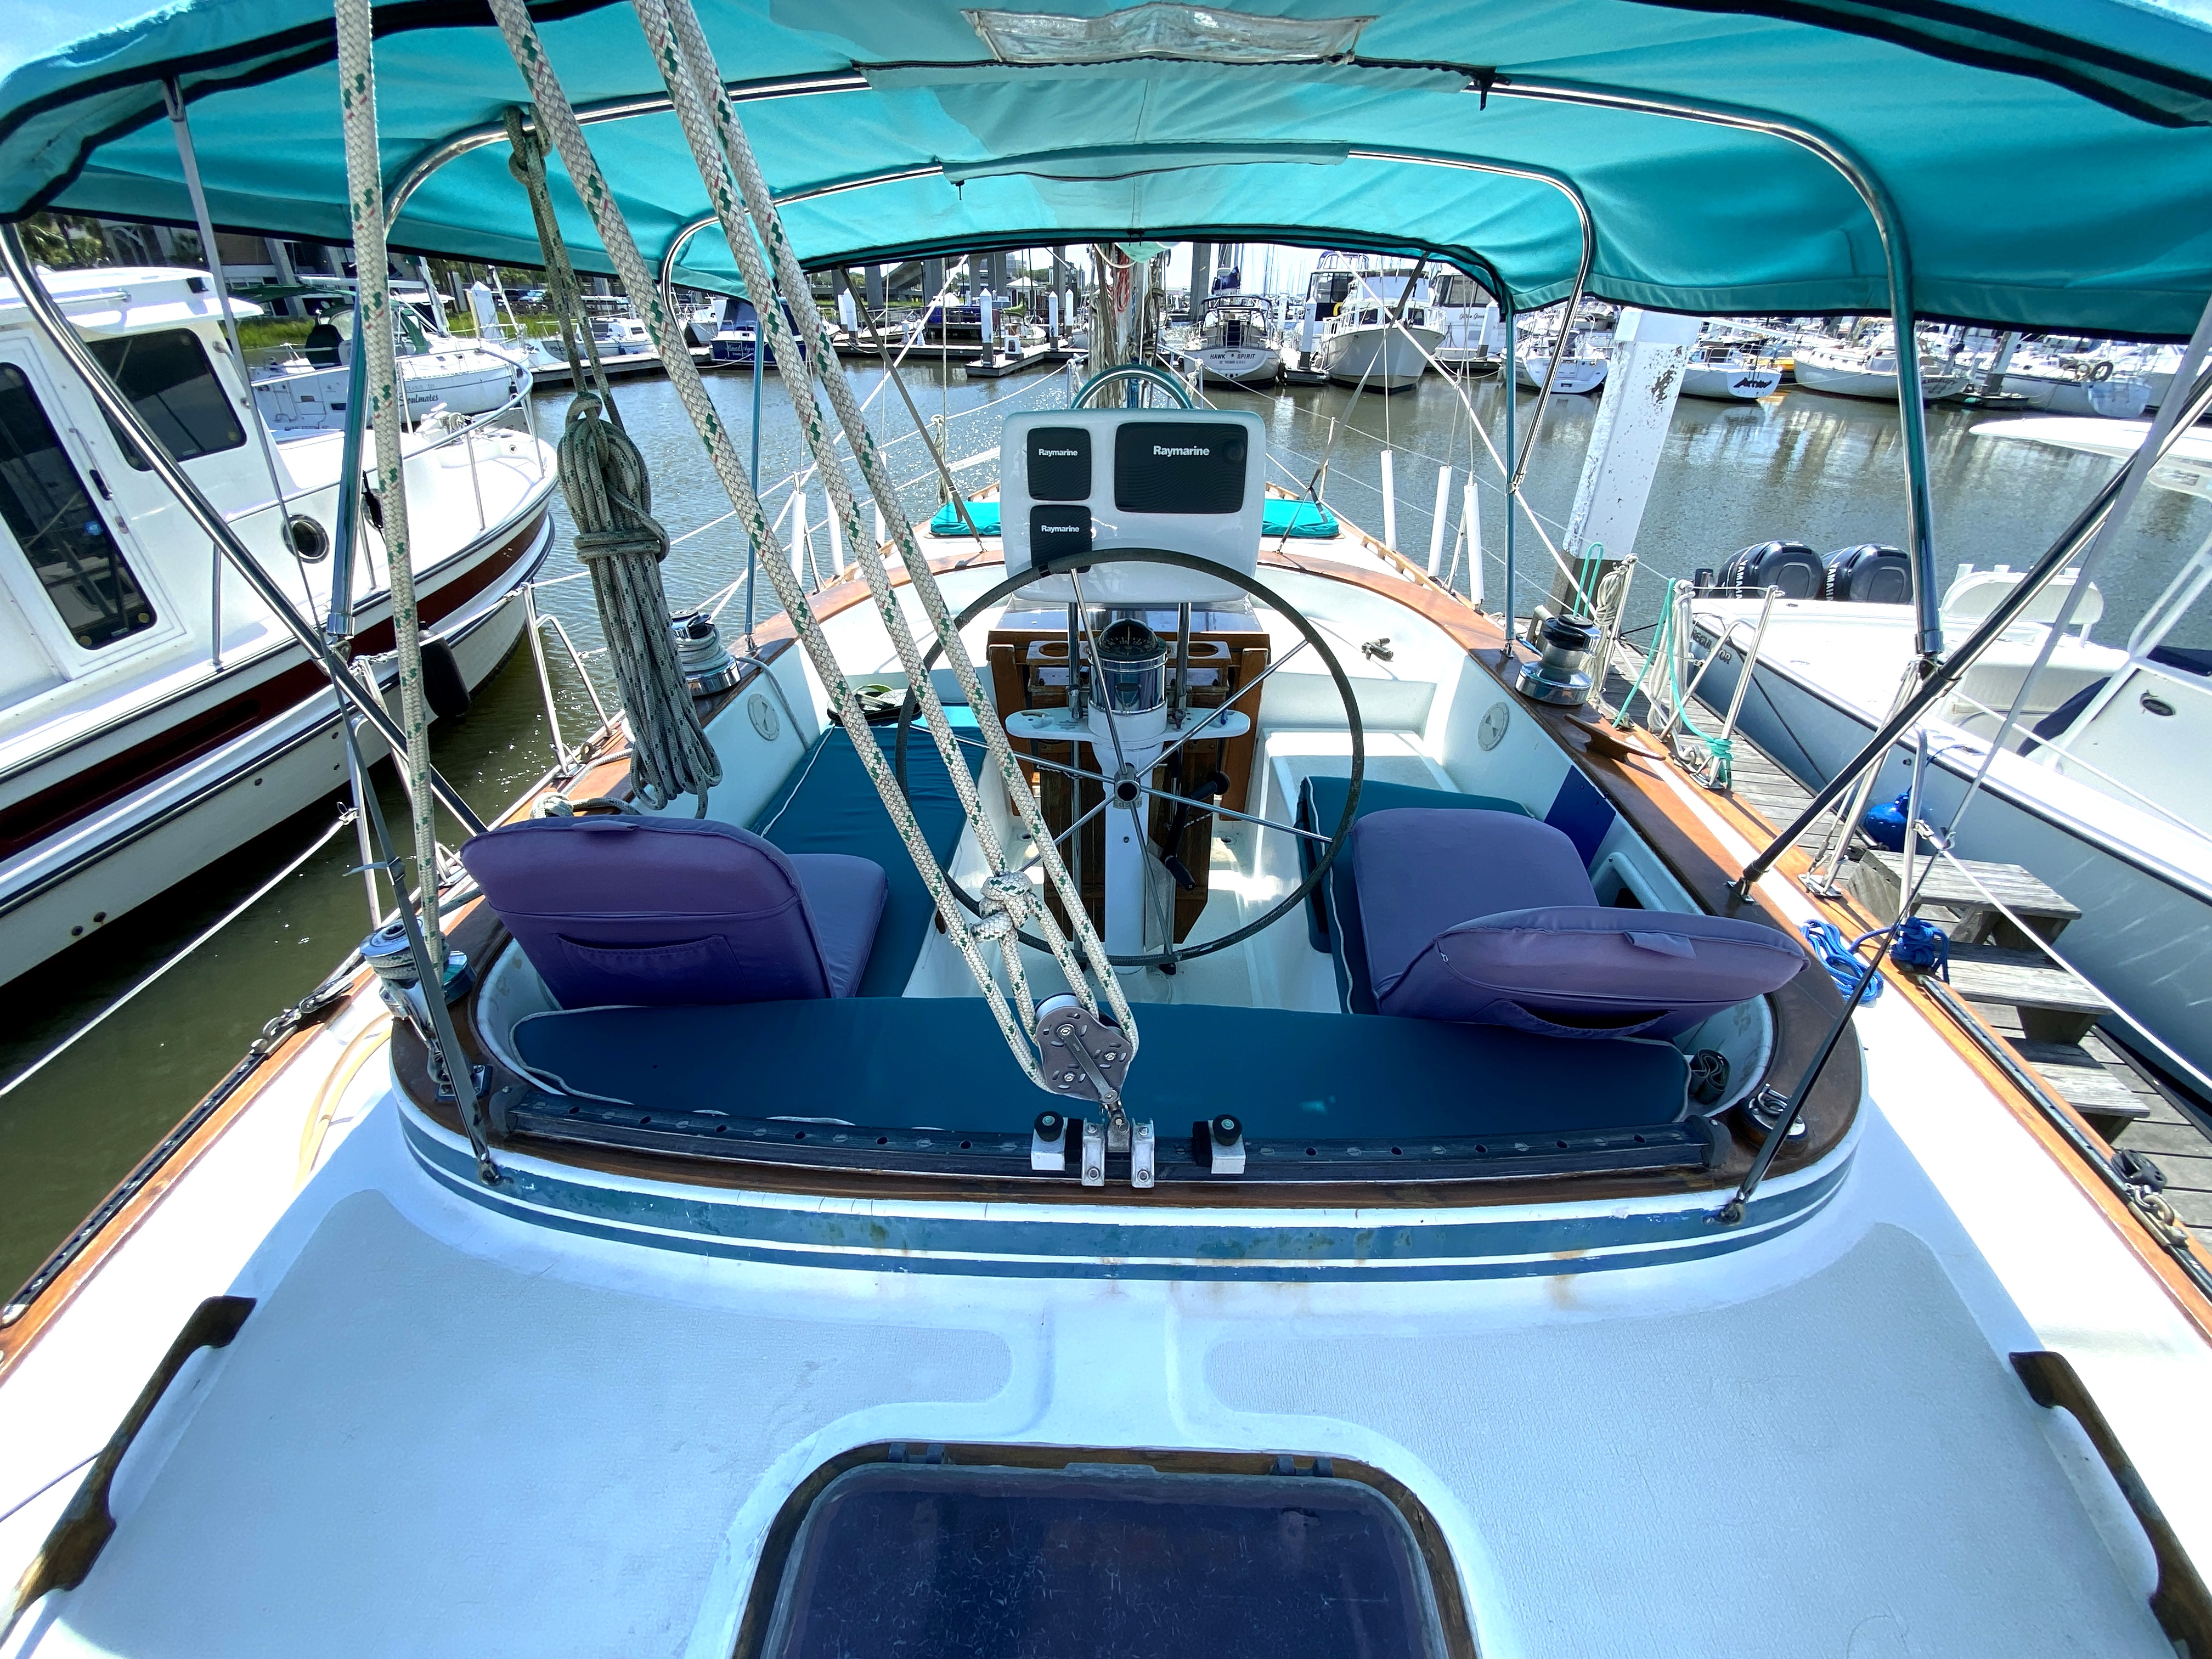 Endeavour 40 Center Cockpit - Endeavour 40 Center Cockpit